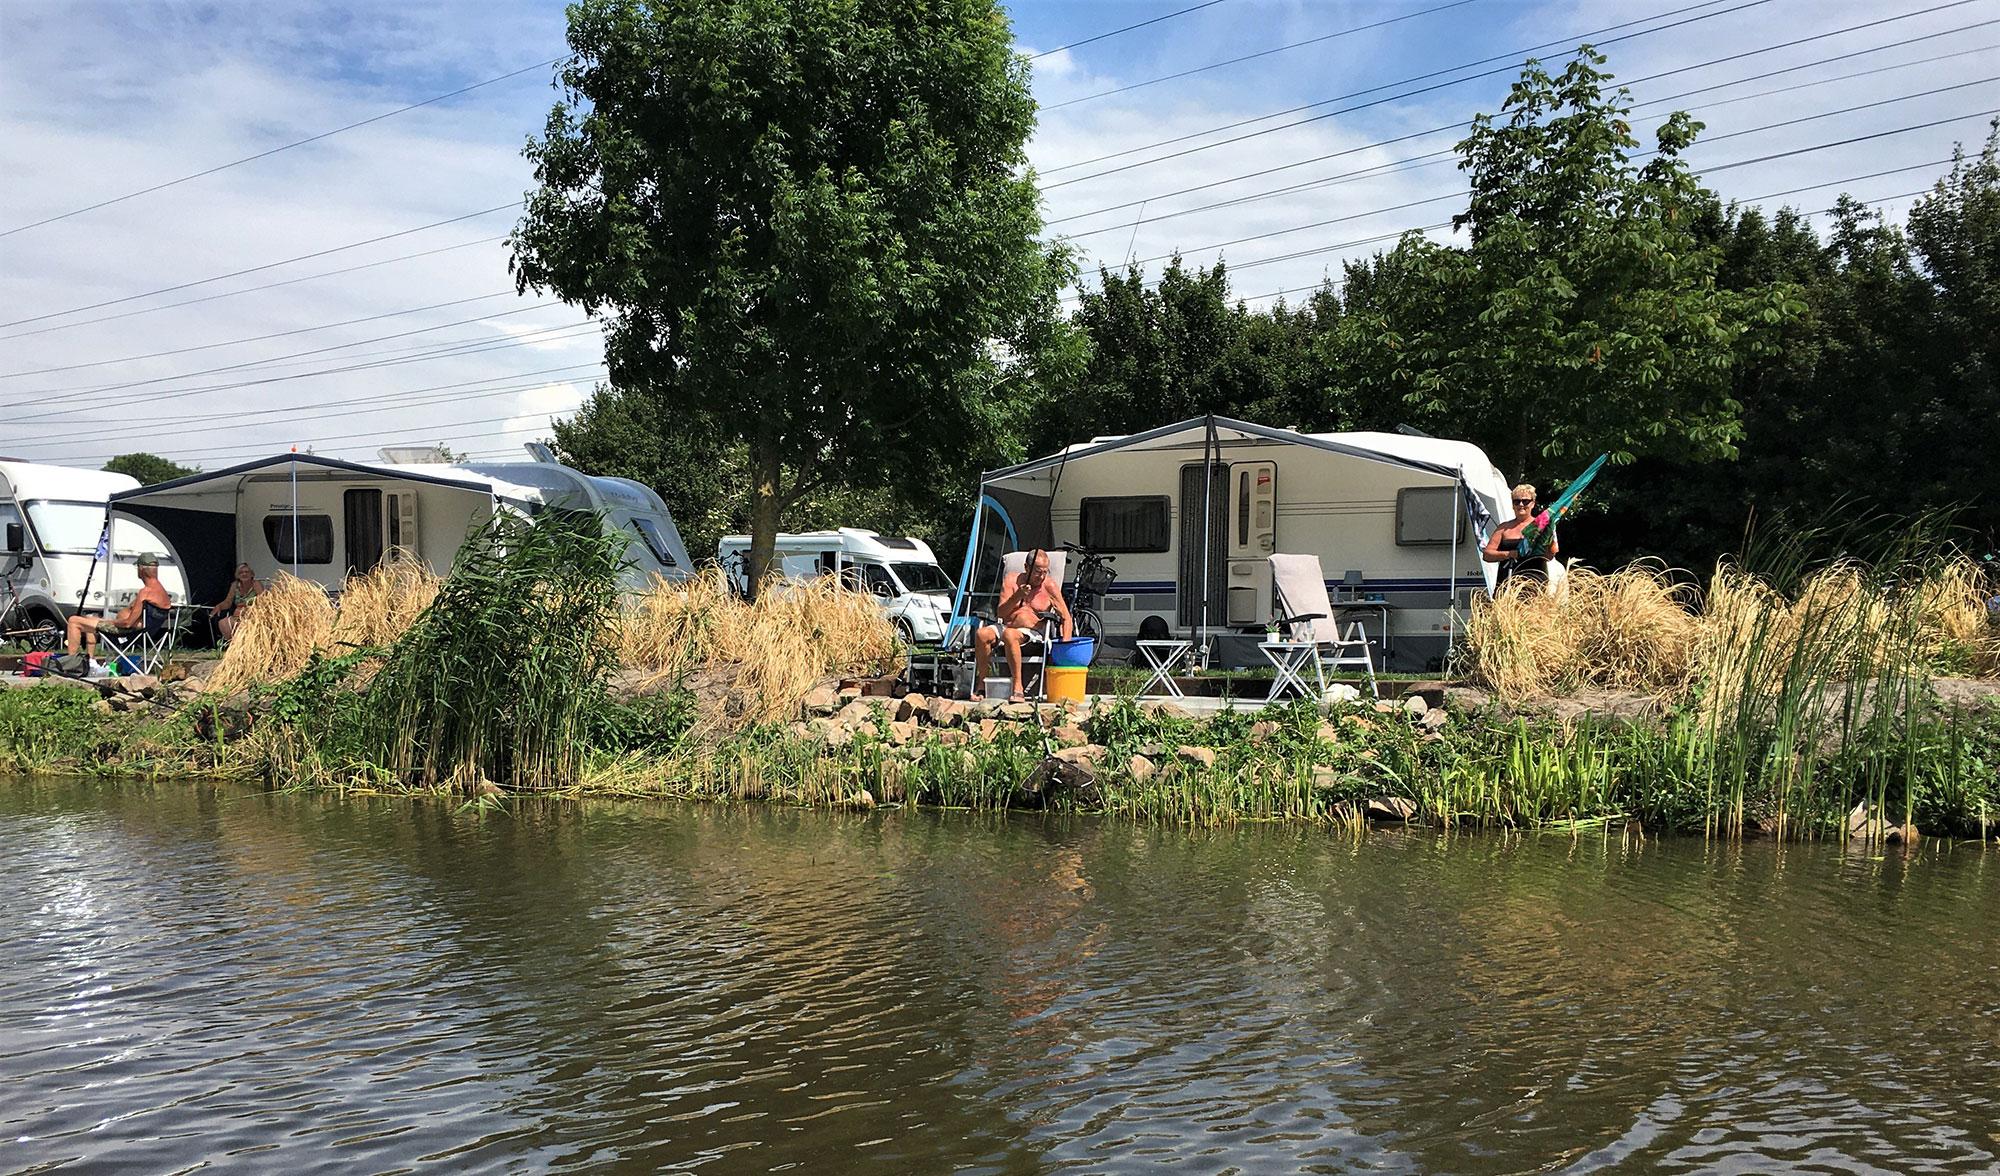 Kamperplaats met prive terras aan het water